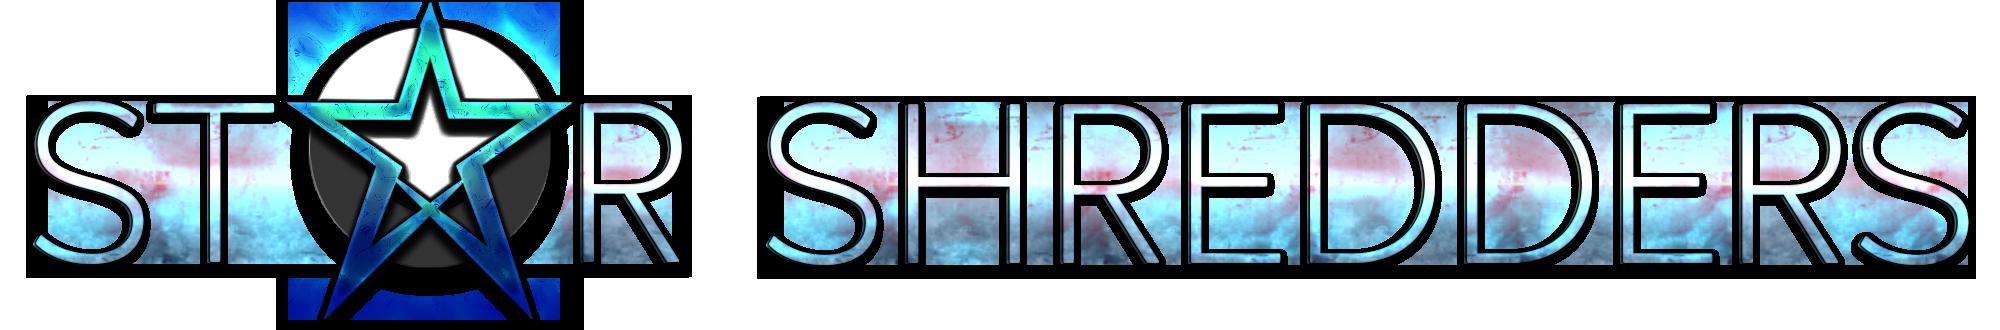 New_Logo_Single_Row.png